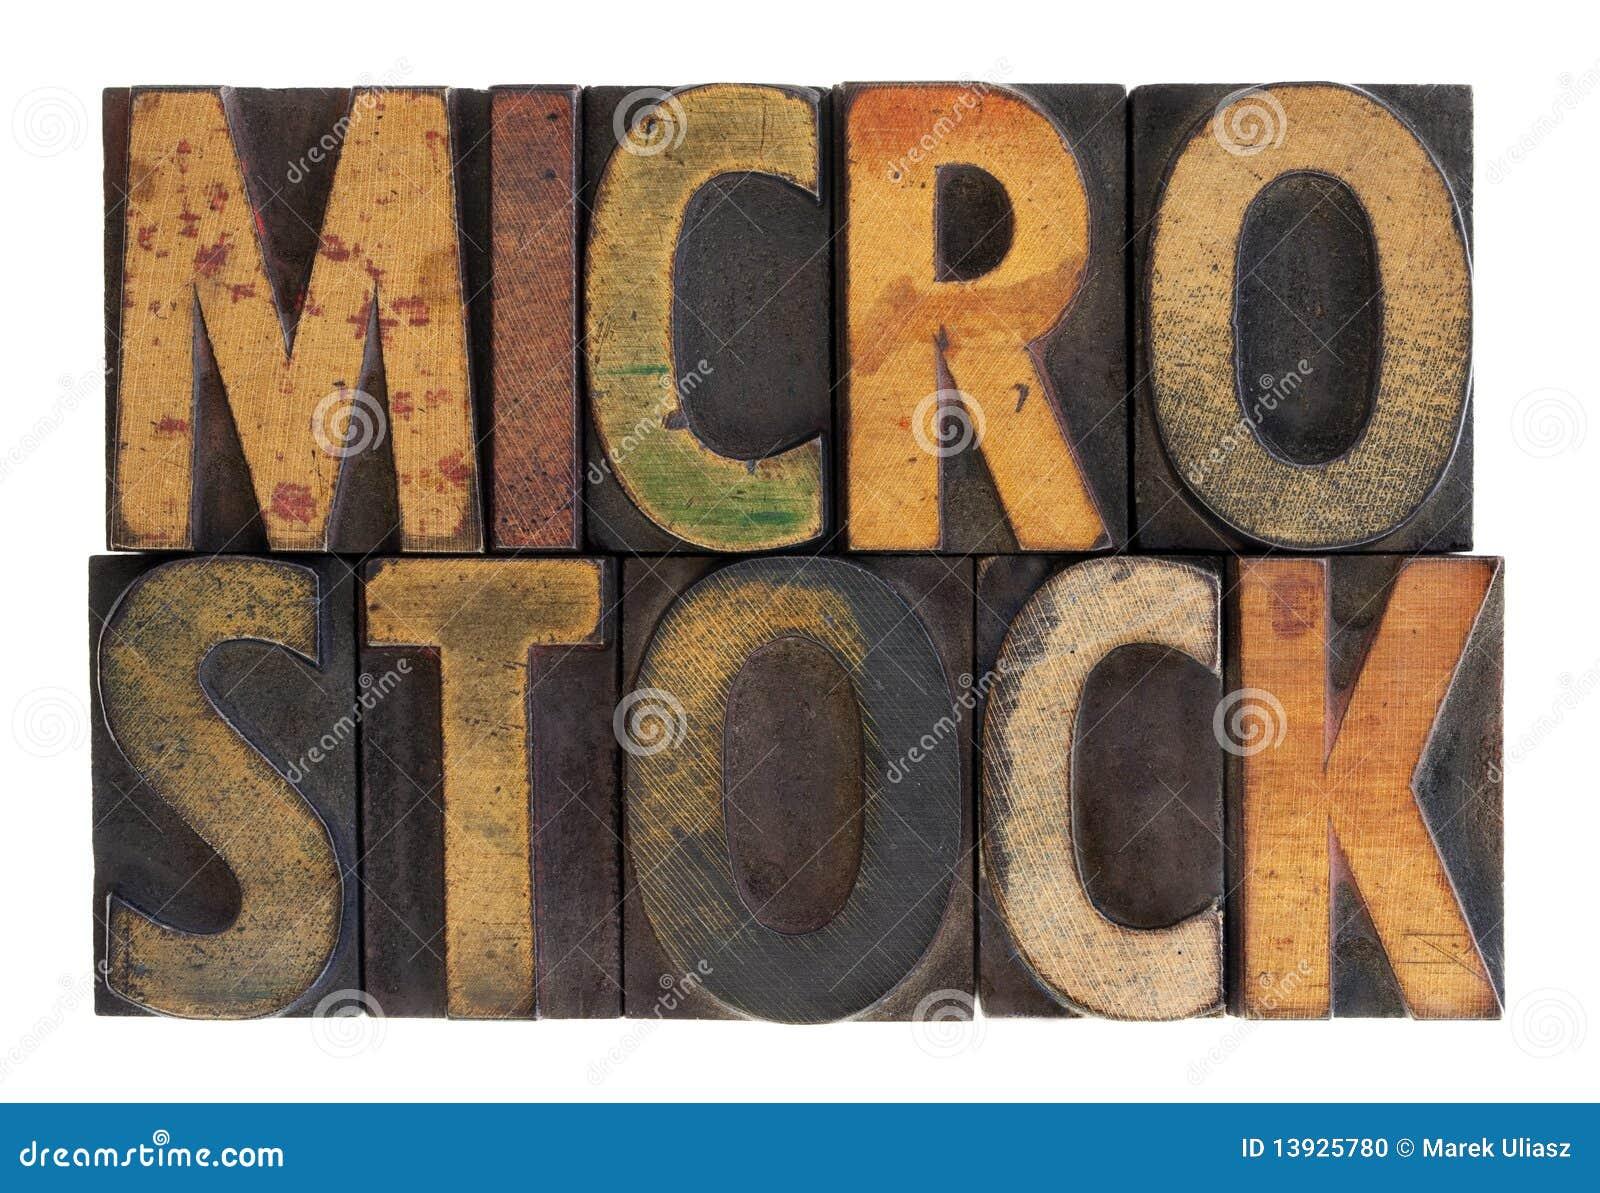 Microstock - vintage wood letterpress type